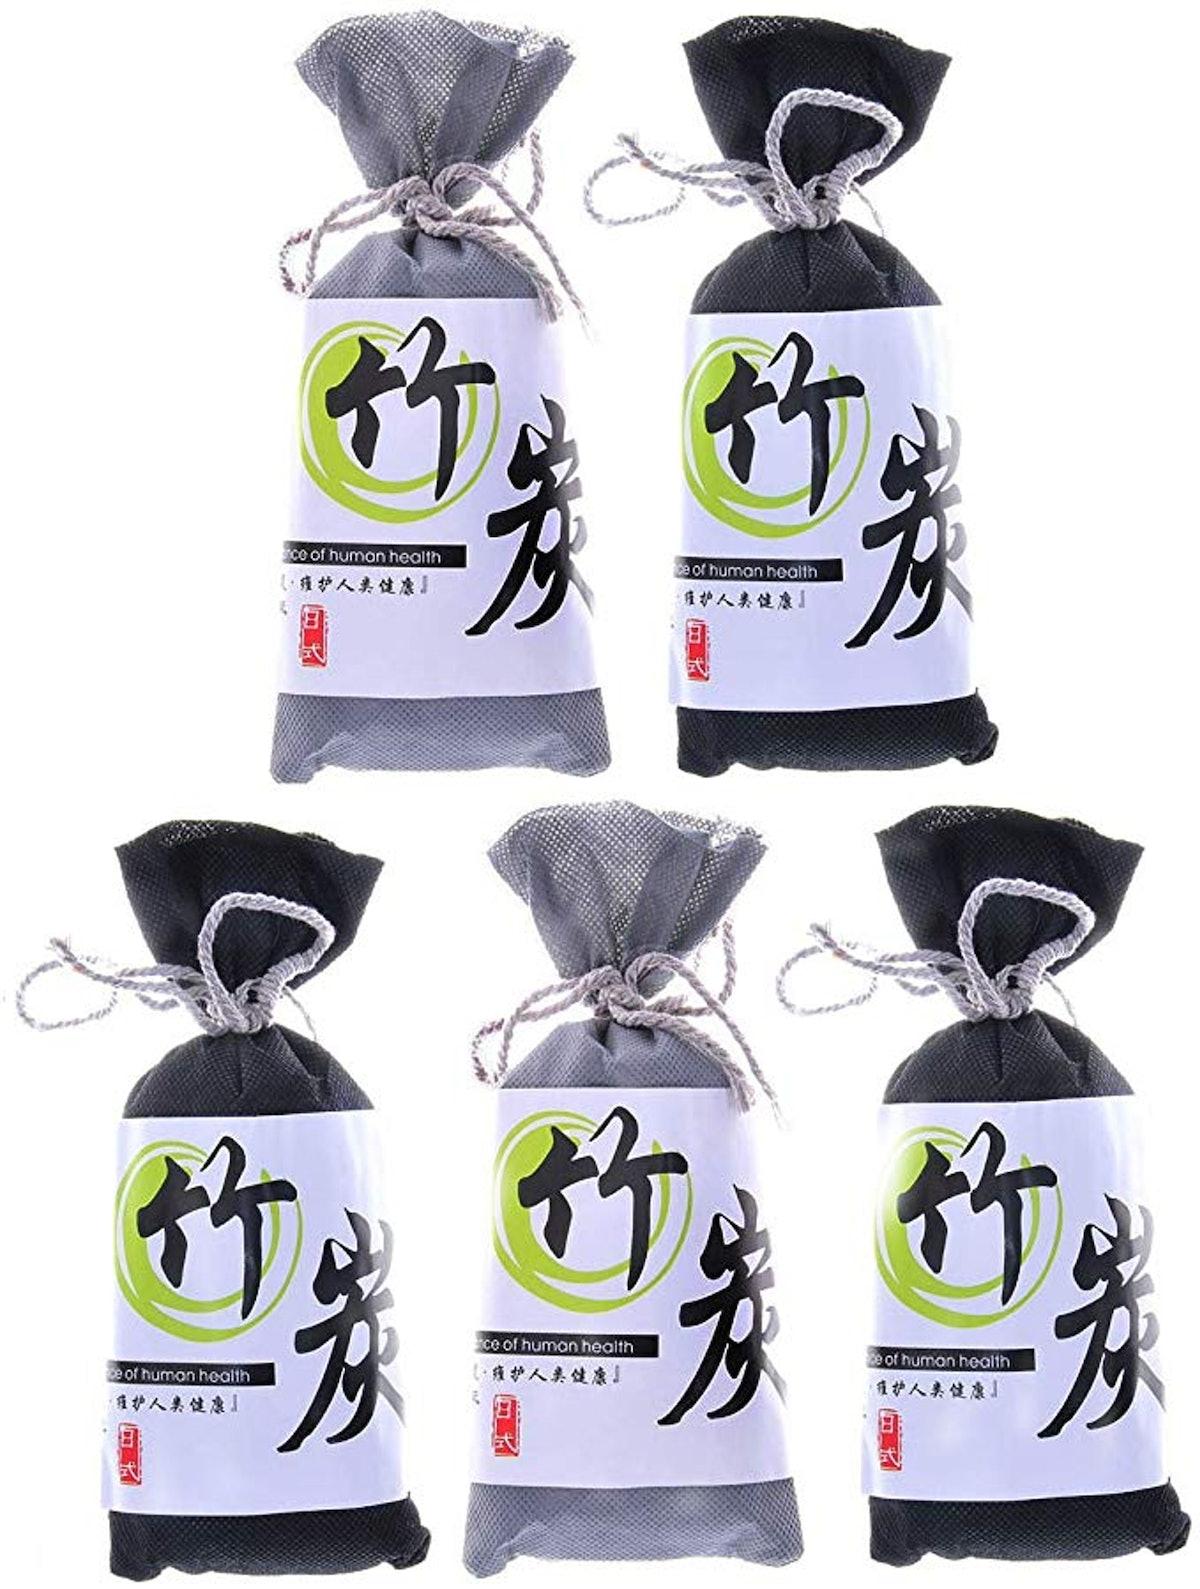 Homy Feel Air Purifying Bamboo Charcoal Air Freshener (5-Pack)